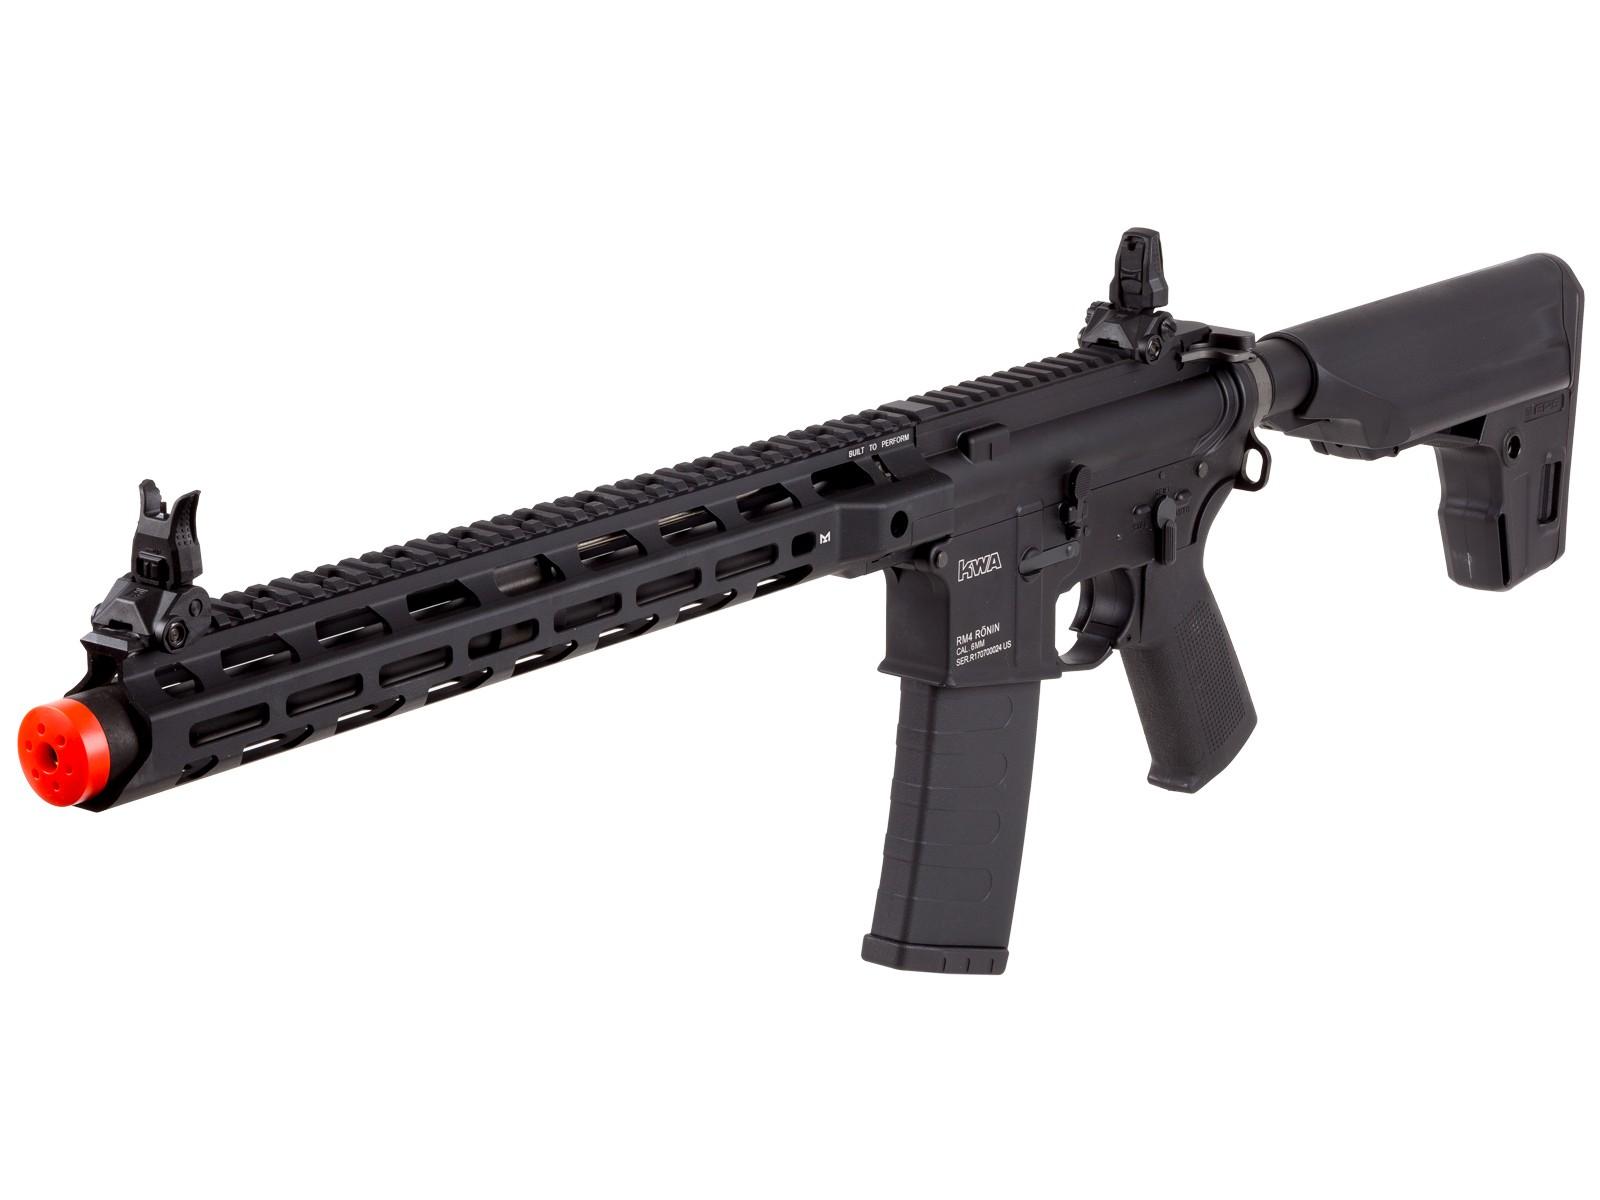 KWA_AEG3_RM4_Ronin_Recon_ML_Airsoft_Carbine_6mm